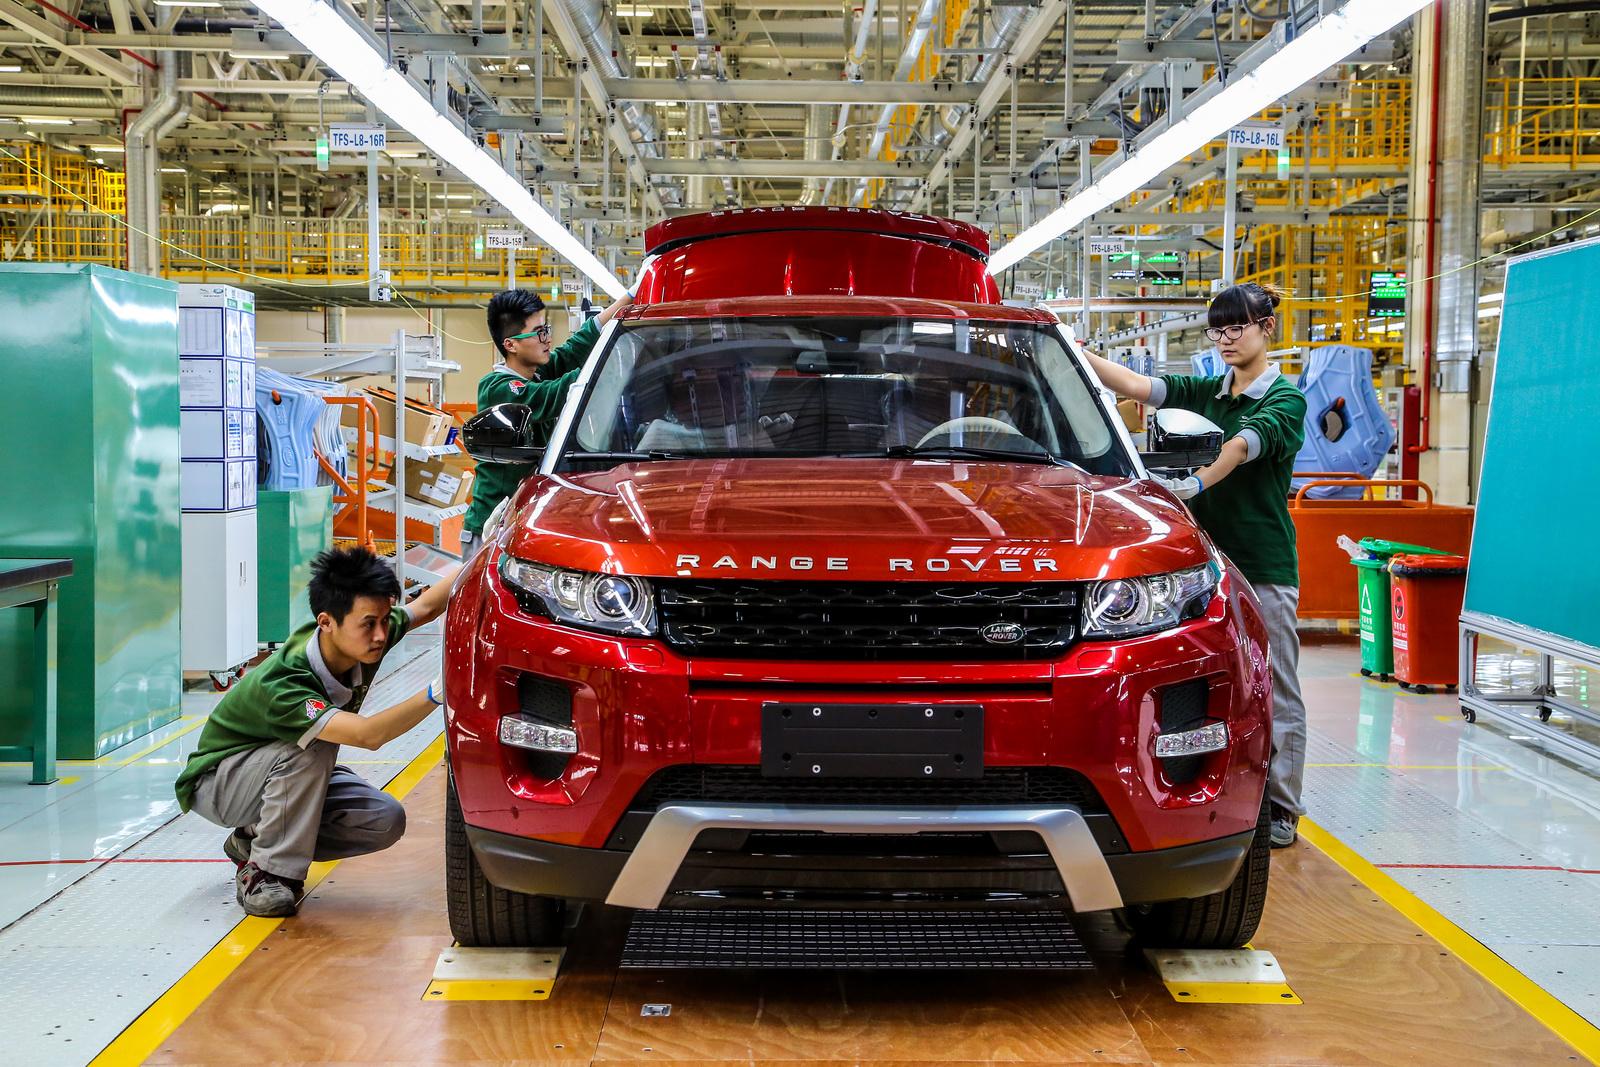 Jaguar Land Rover Chinese Factory Kicks Off Production - GTspirit